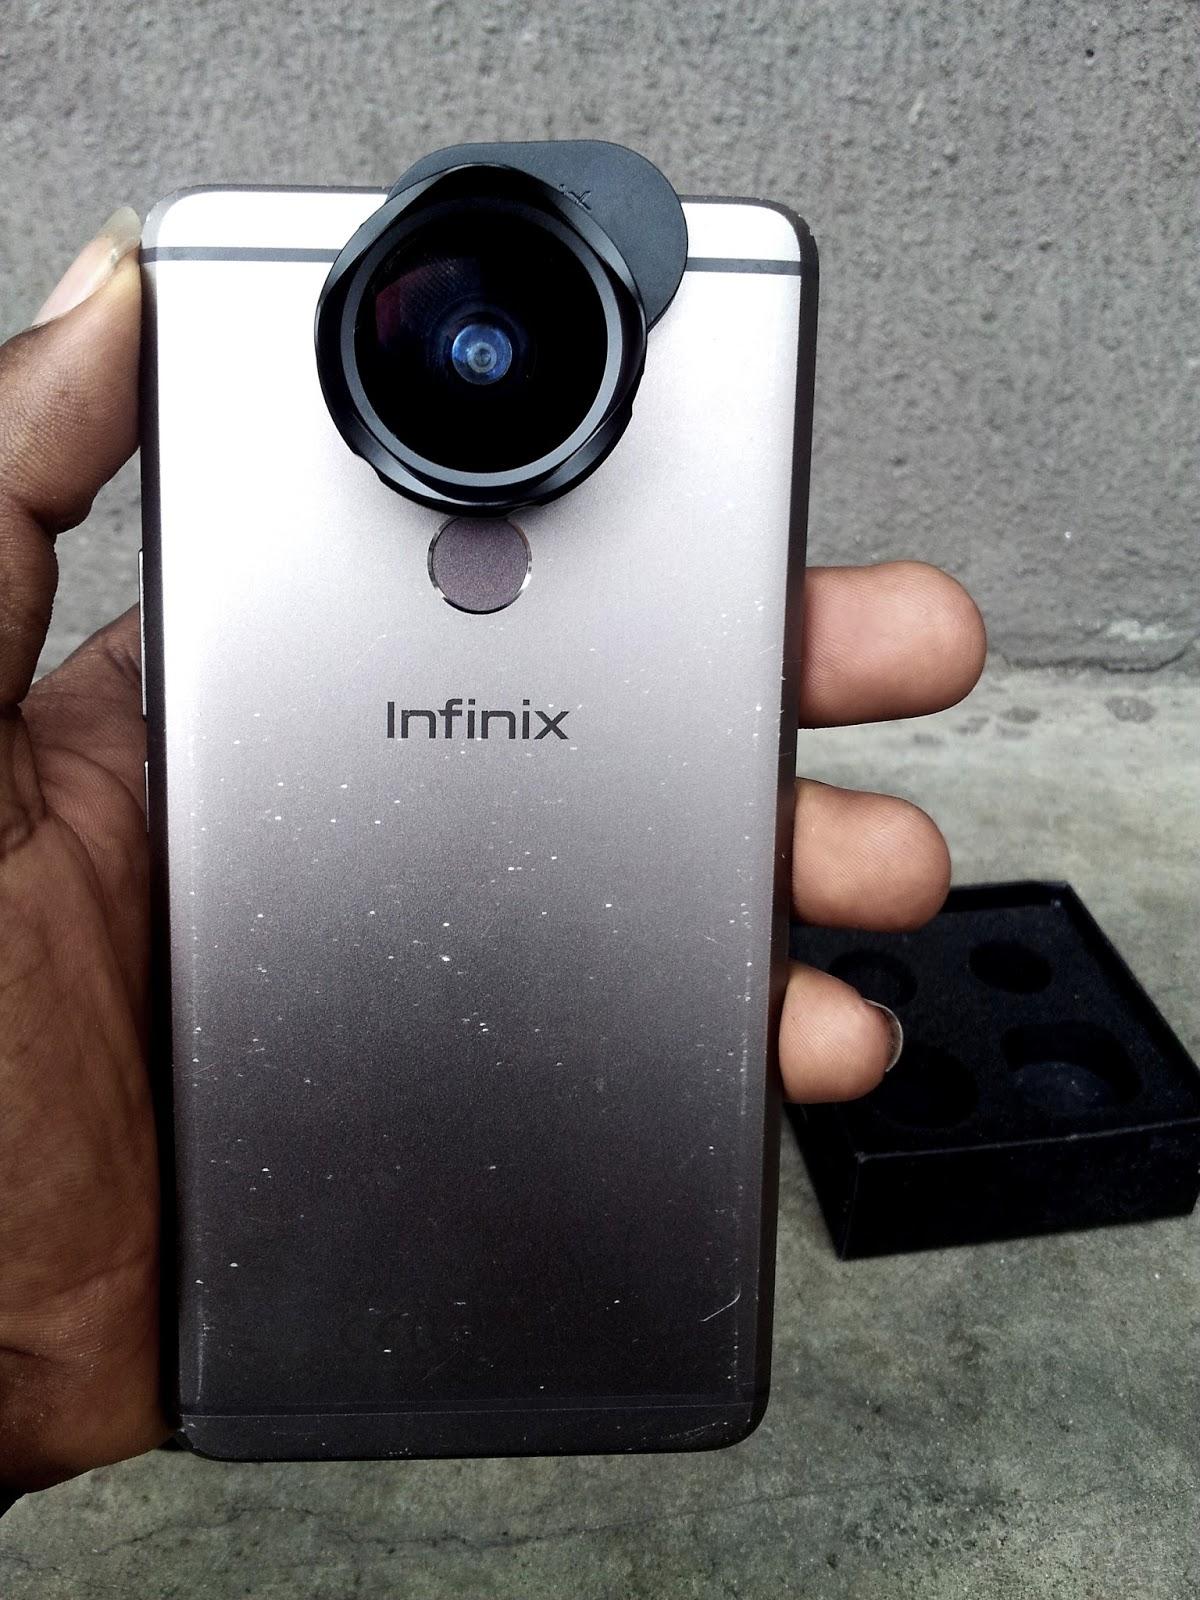 Rear View of Infinix Mobile Camera Lens On The Infinix Zero 4 Smart Phone